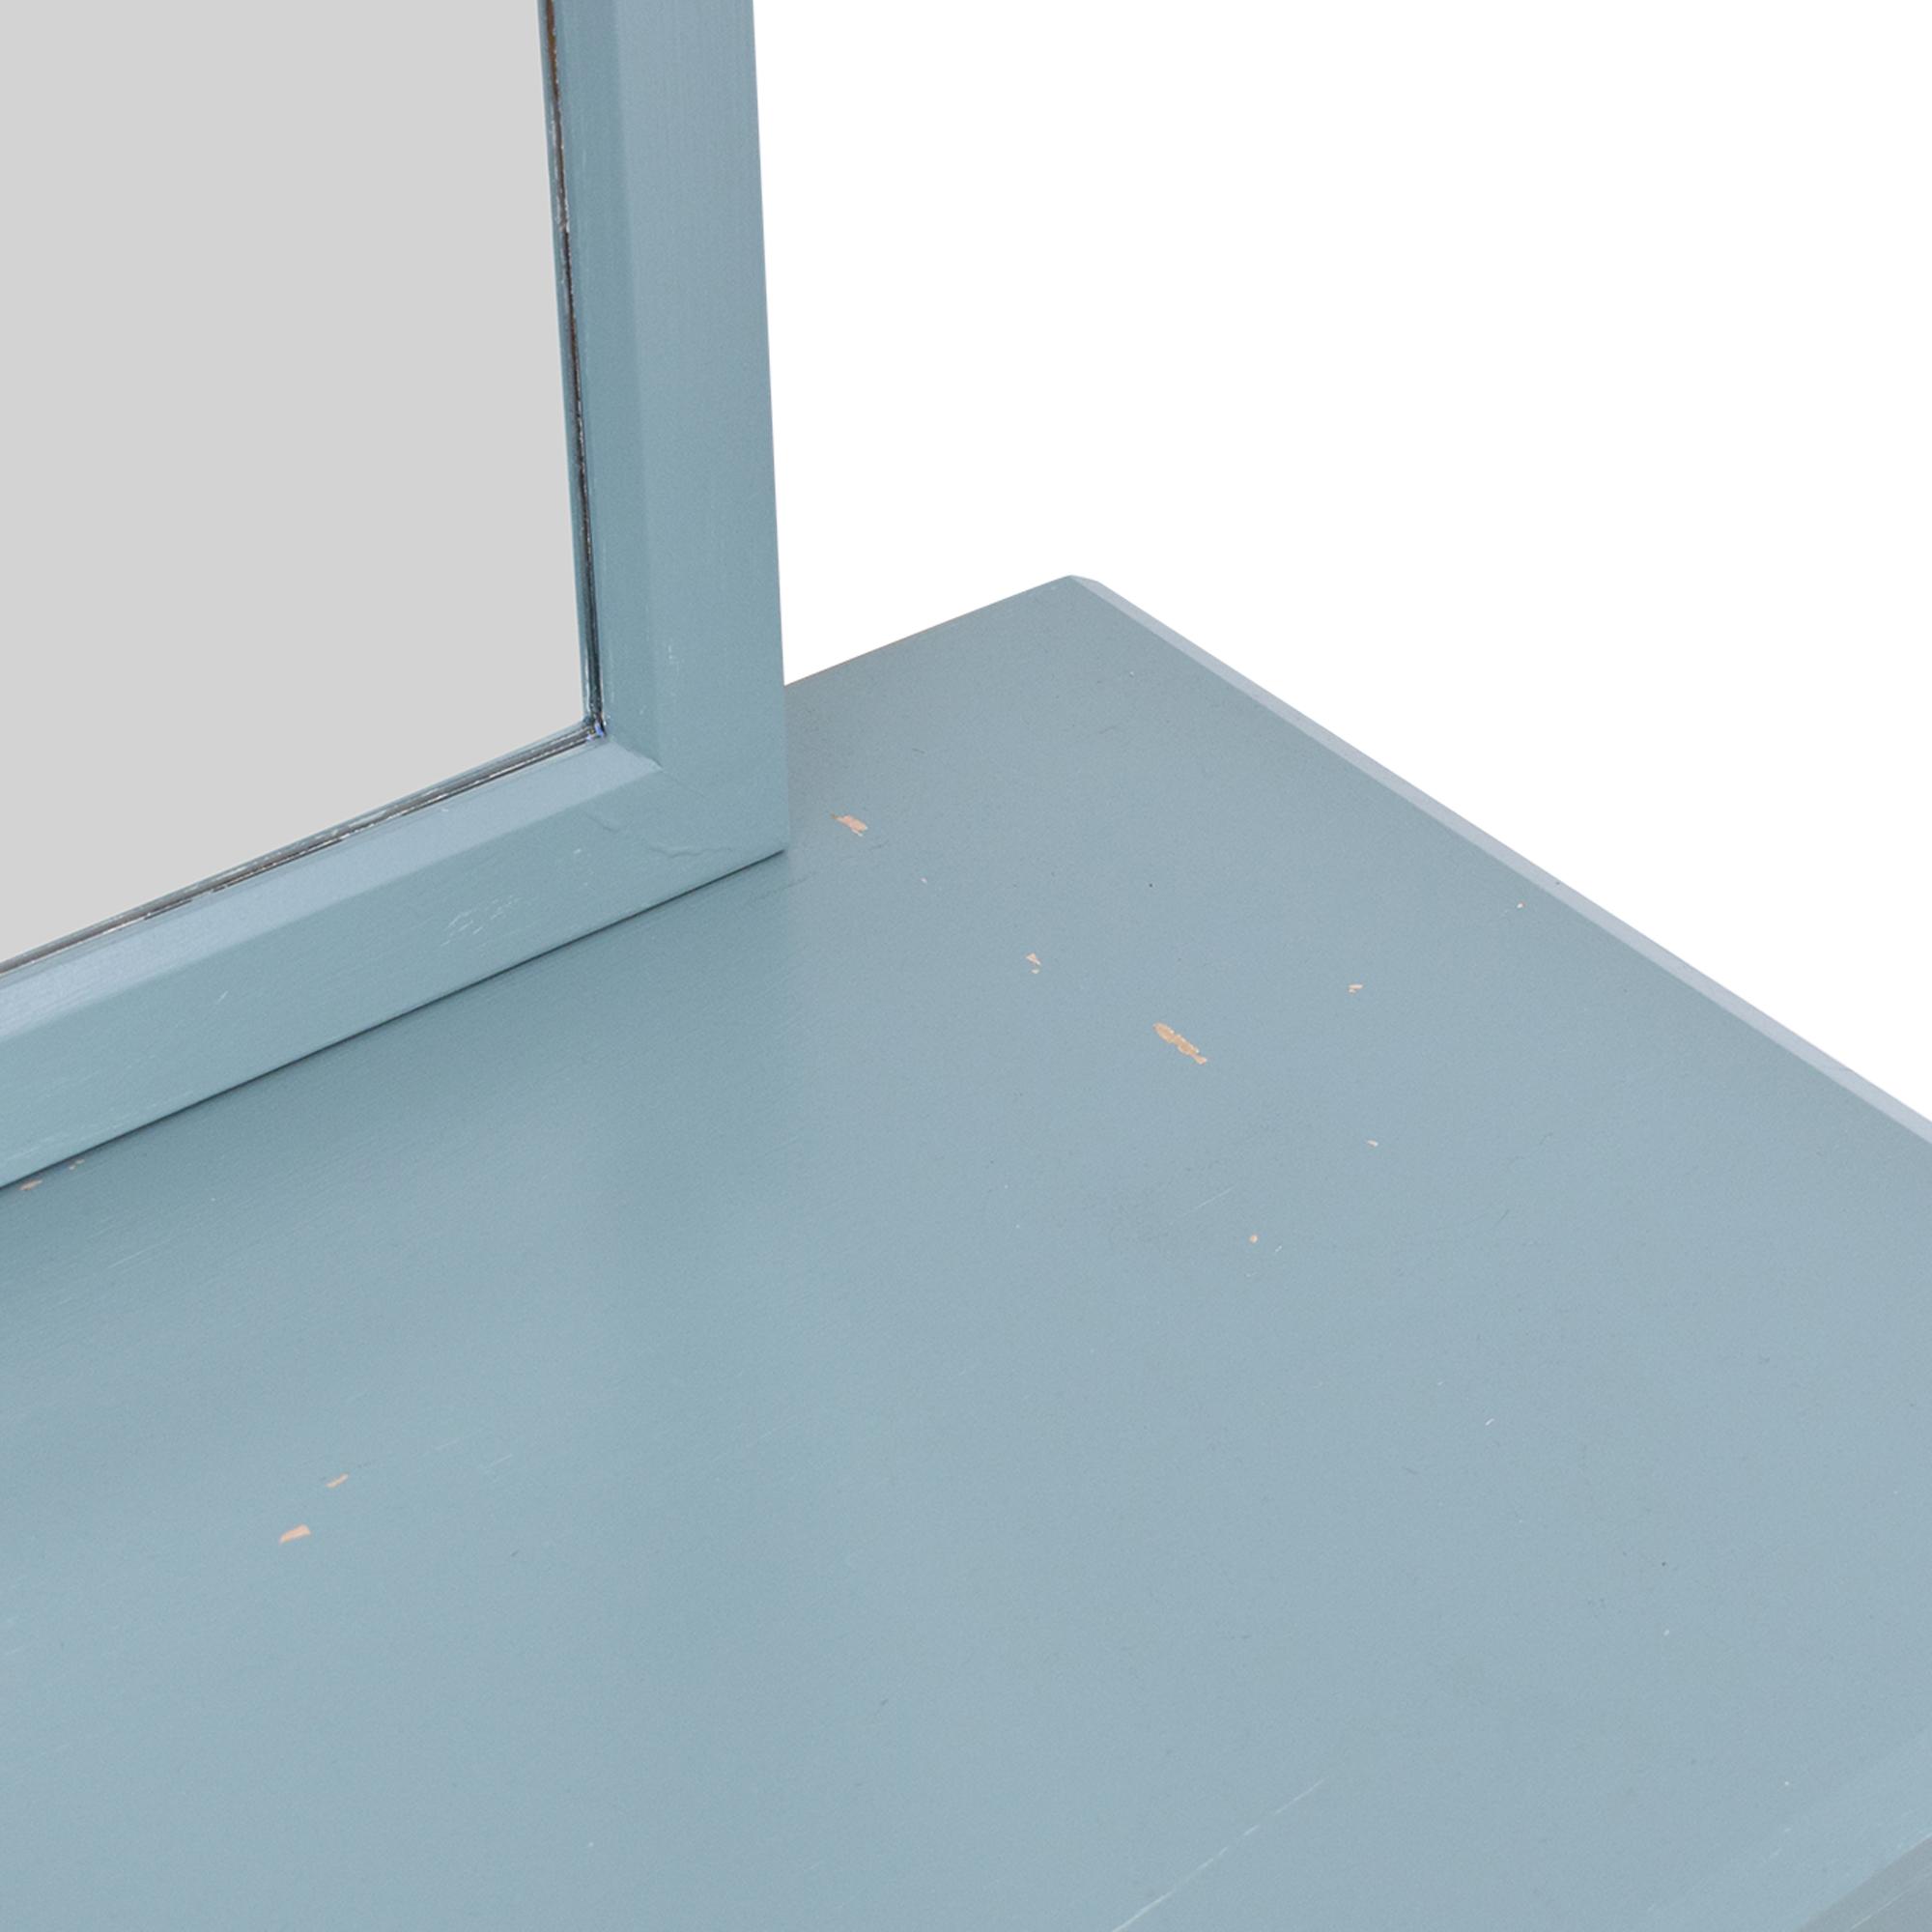 Ethan Allen Ethan Allen American Dimensions Dresser with Mirror light blue